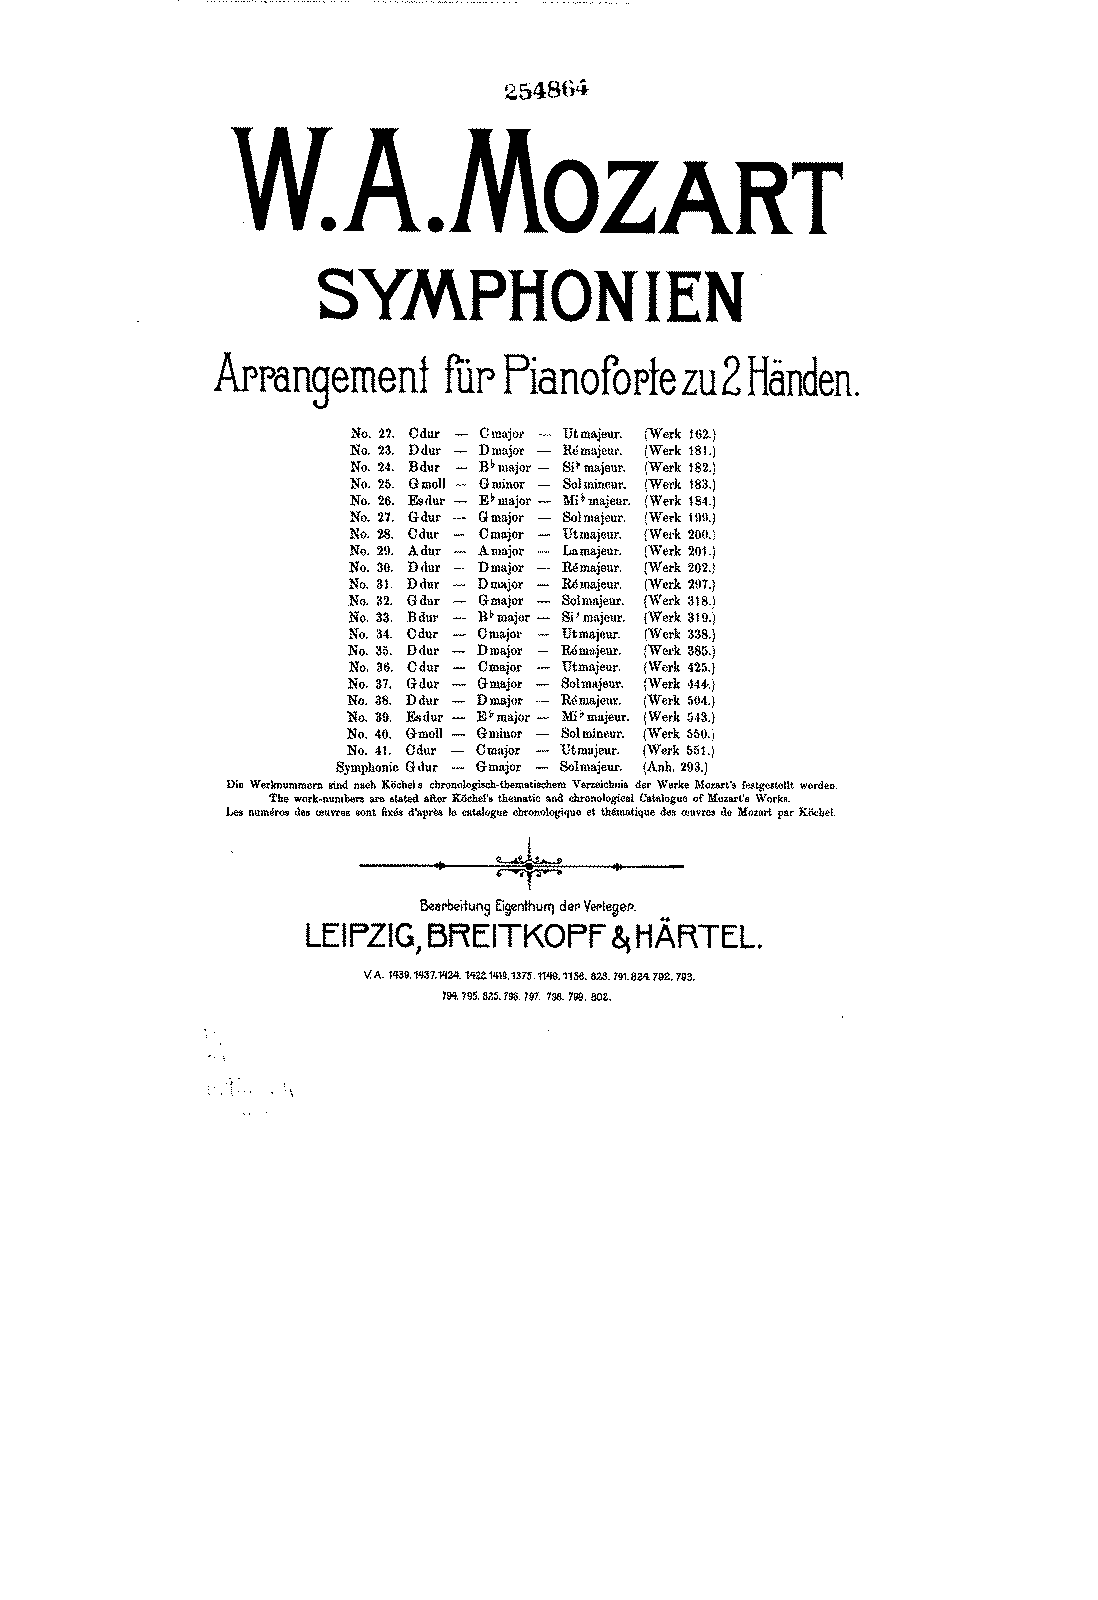 Symphony No.41 in C major, K.551 (Mozart, Wolfgang Amadeus)